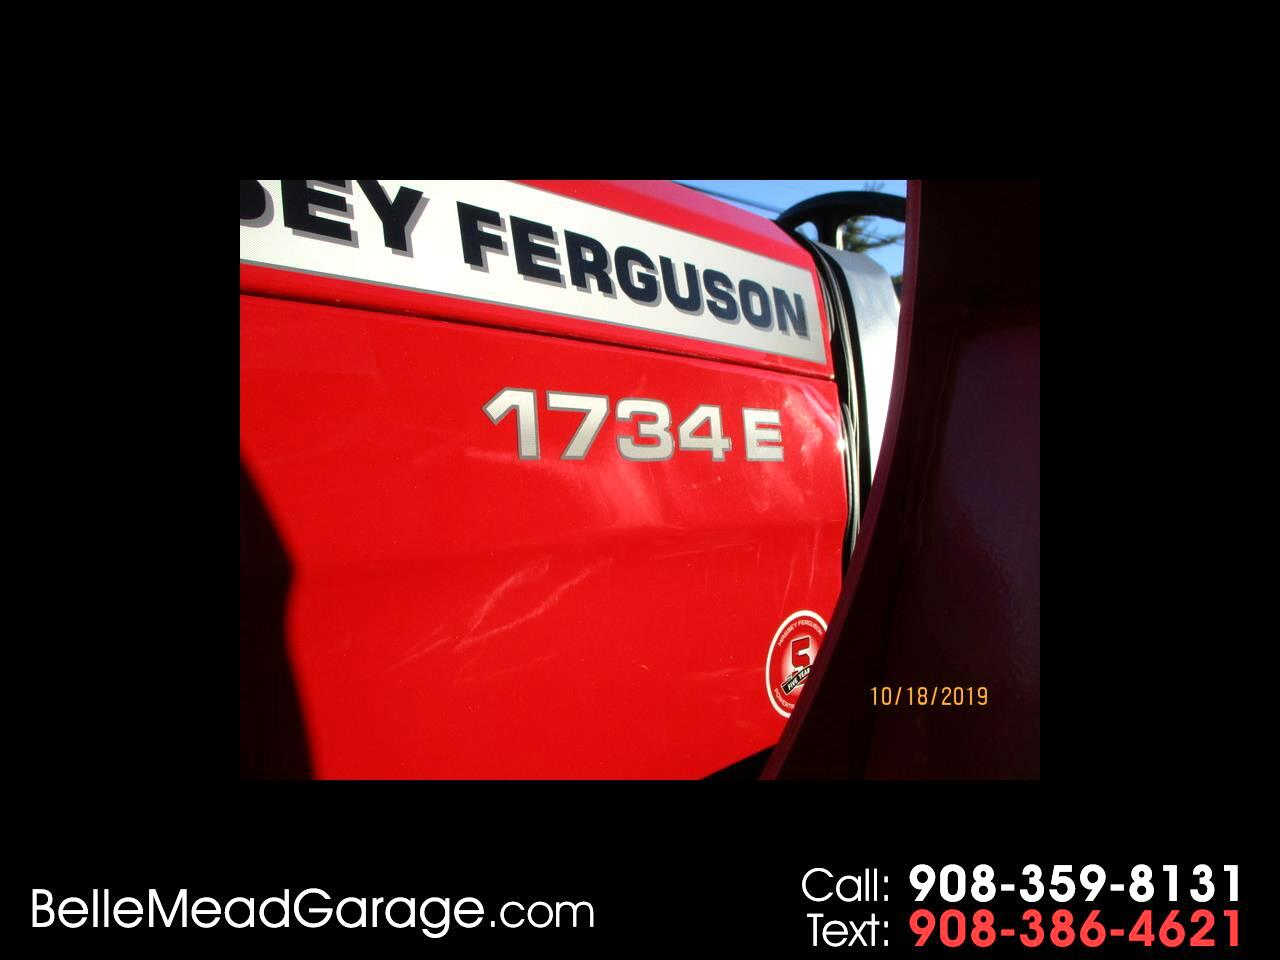 2019 Massey Ferguson Farm MF1734EHL 4X4 TRACTOR WITH LOADER